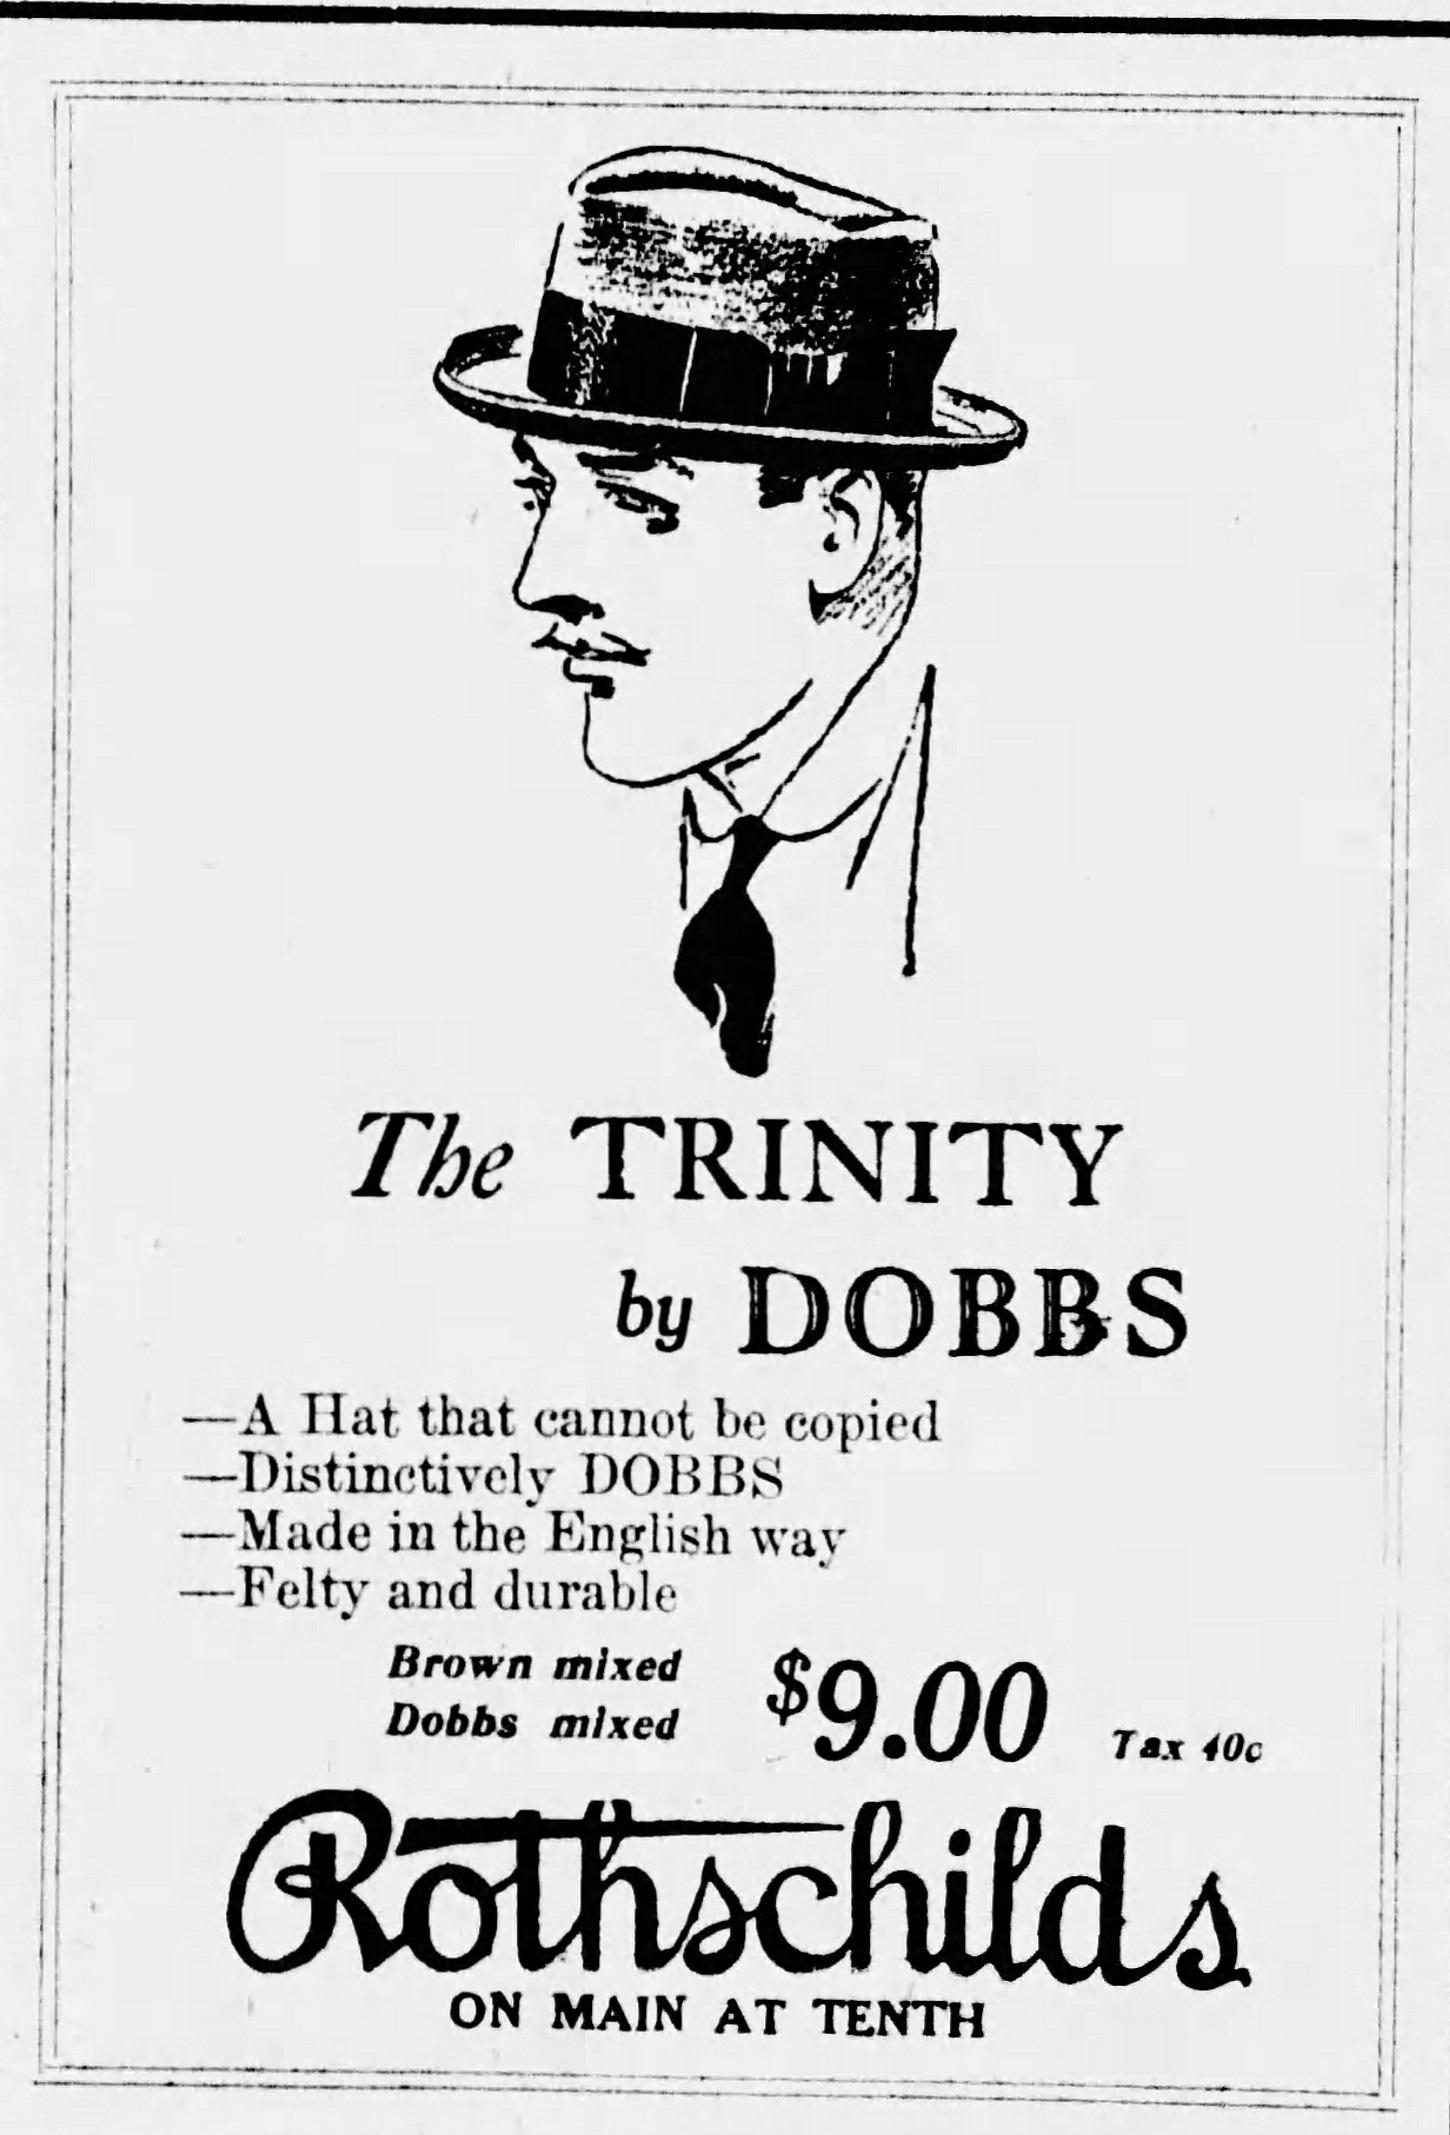 The_Kansas_City_Times_Tue__Sep_6__1921_.jpg